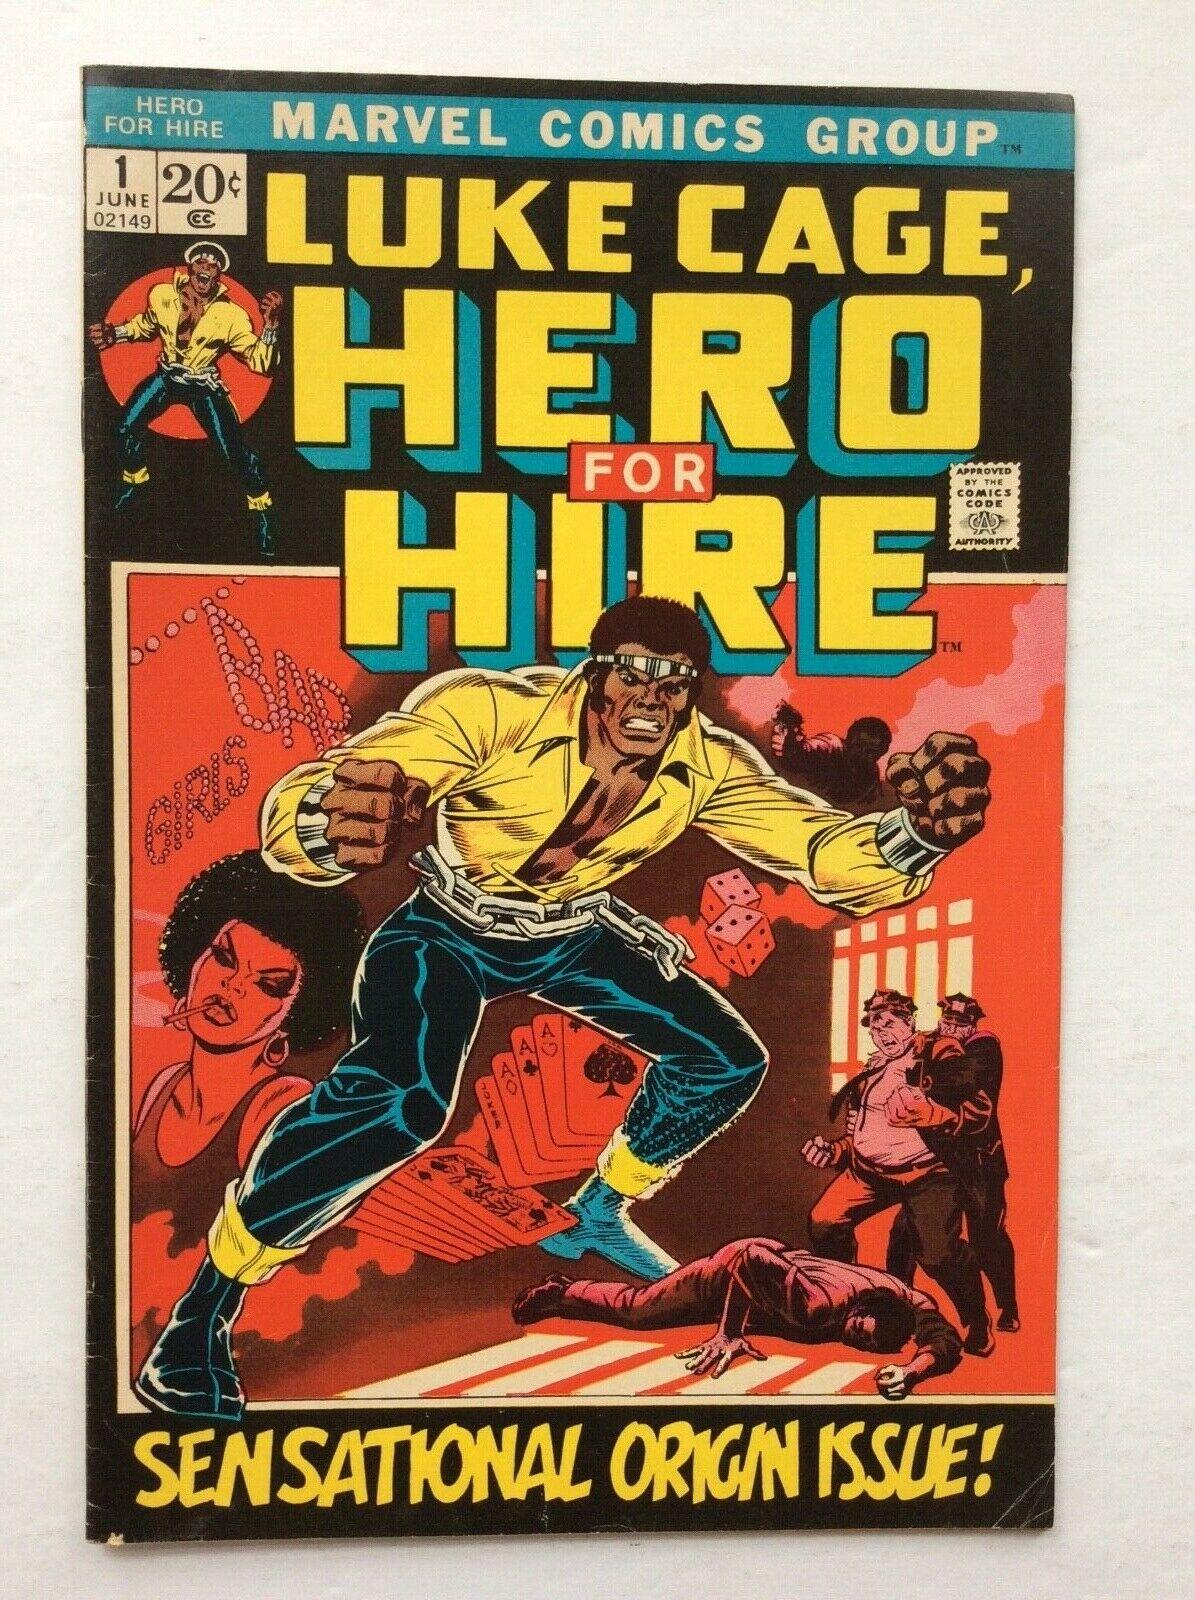 Luke Cage Hero for Hire #1 Marvel Comics 1972 Origin Issue Vintage Comic Book